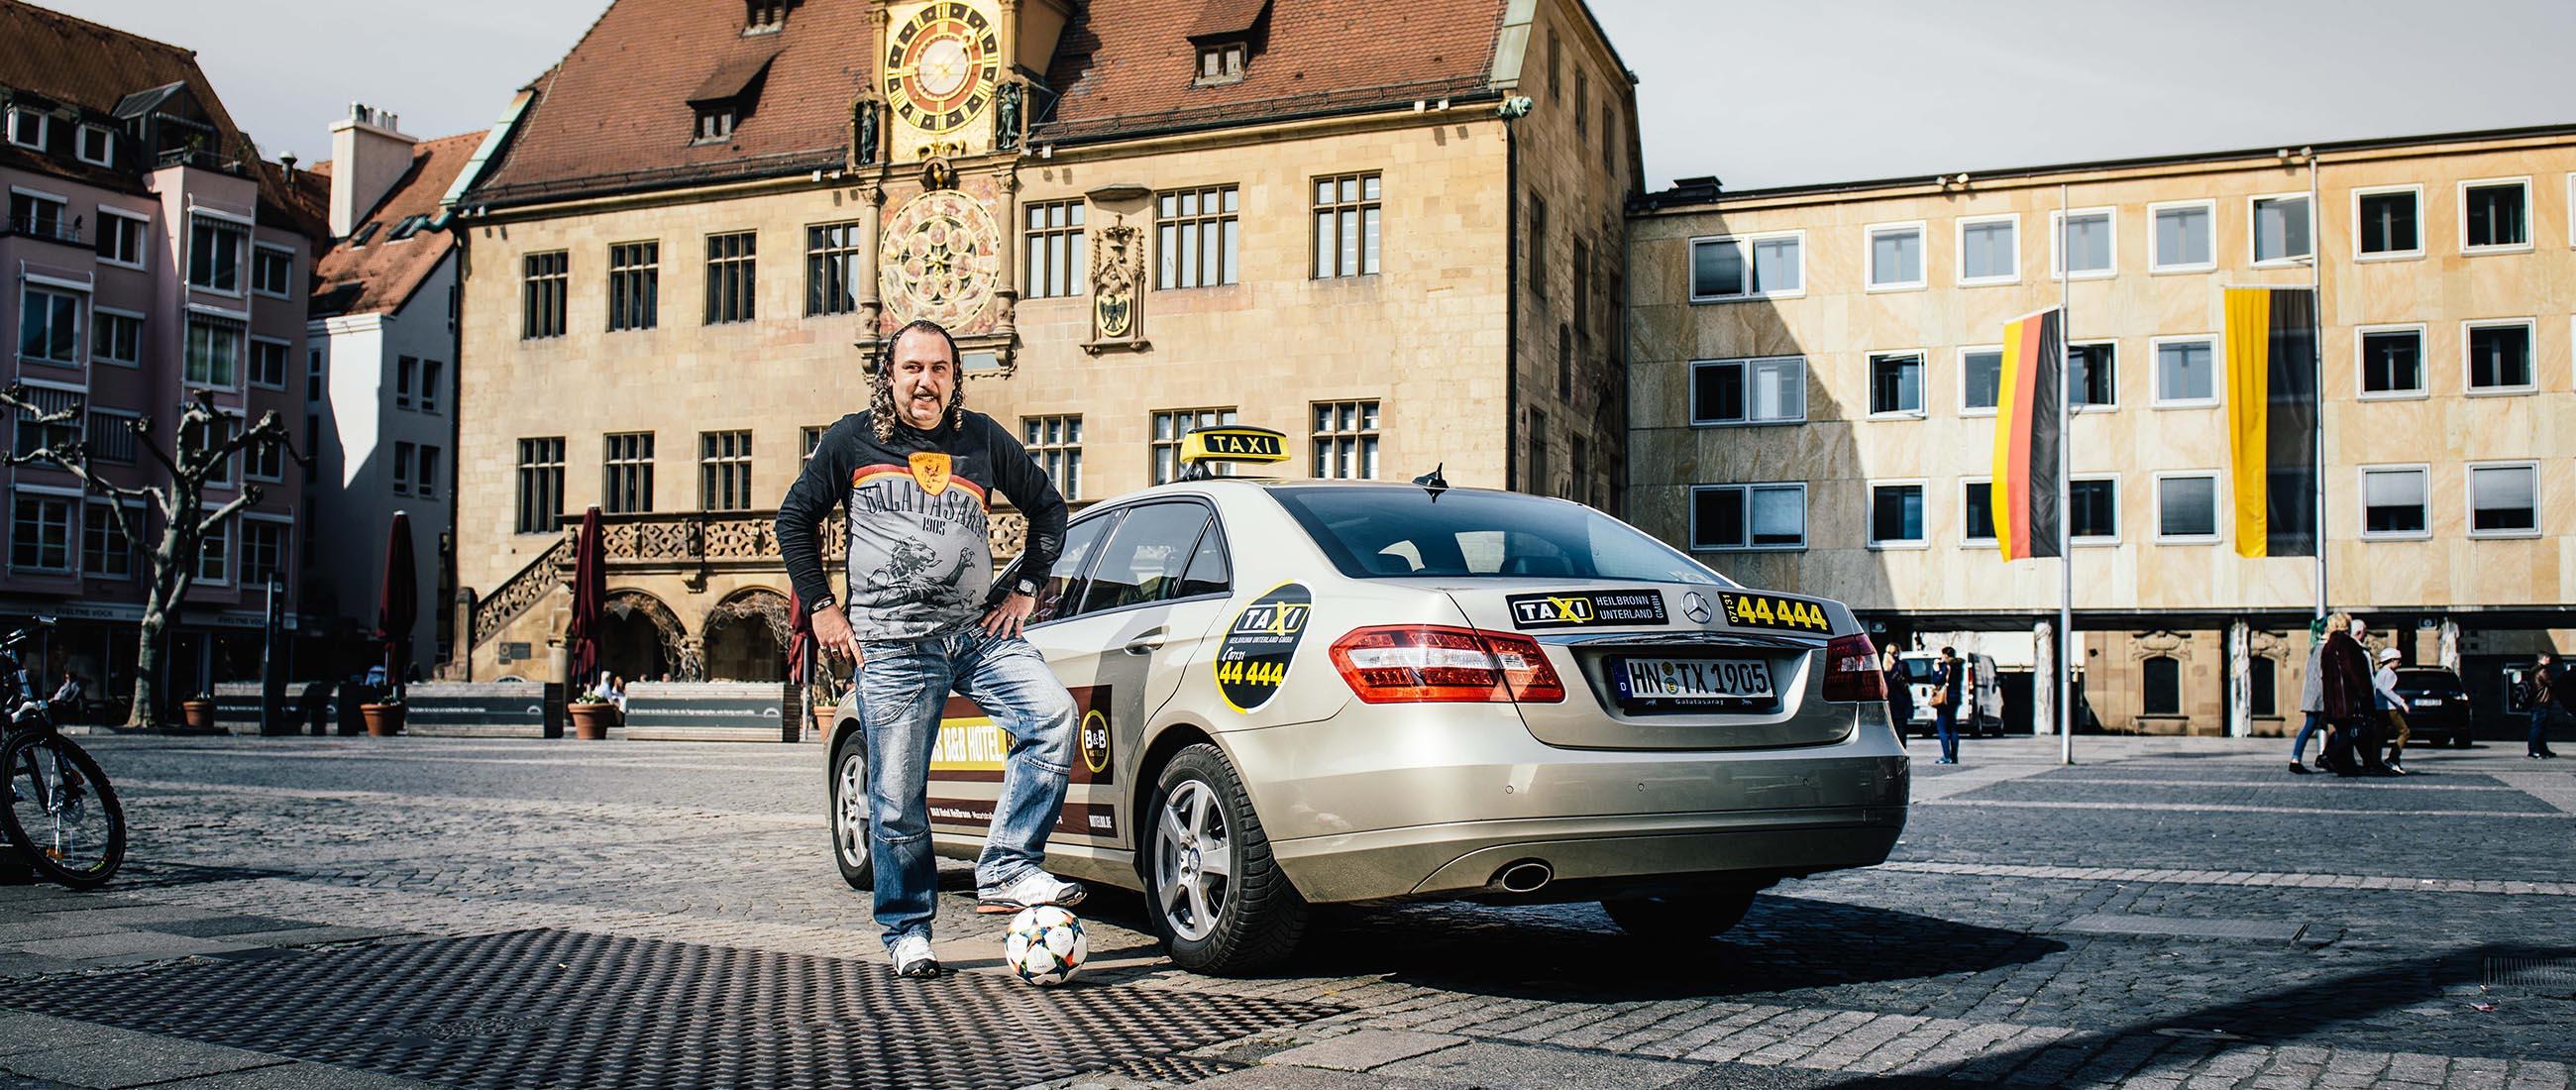 taxi-slider_0006_taxi-unterland-66